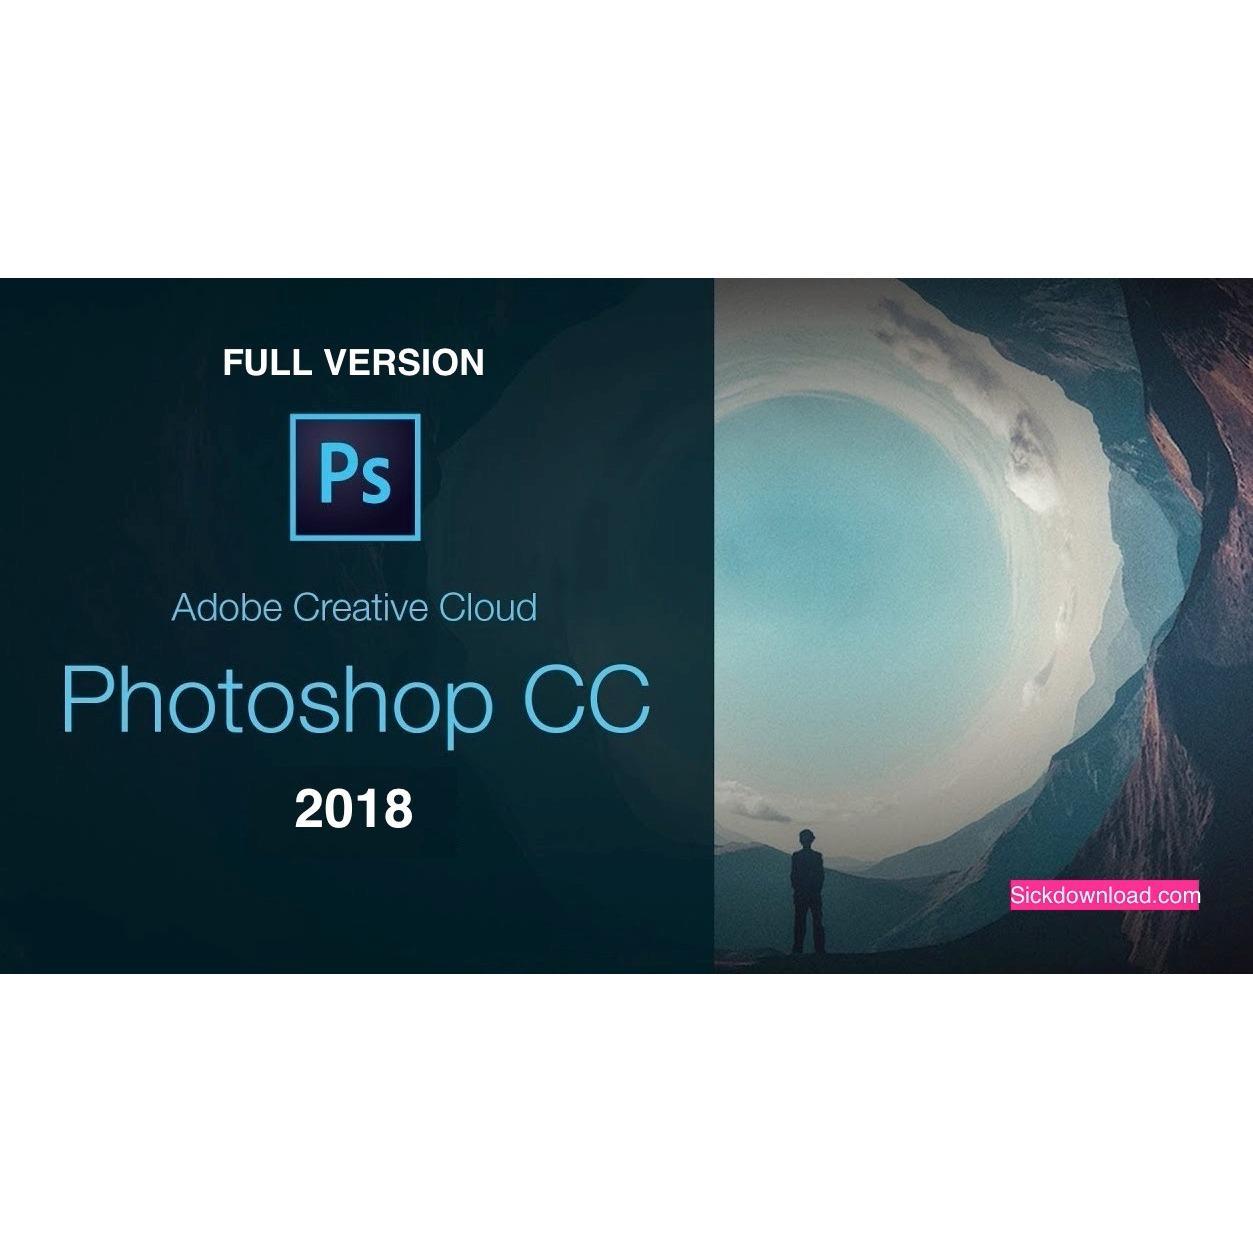 ADOBE PHOTOSHOP CC 2018 + FULL TUTORIAL + FULL BRUST